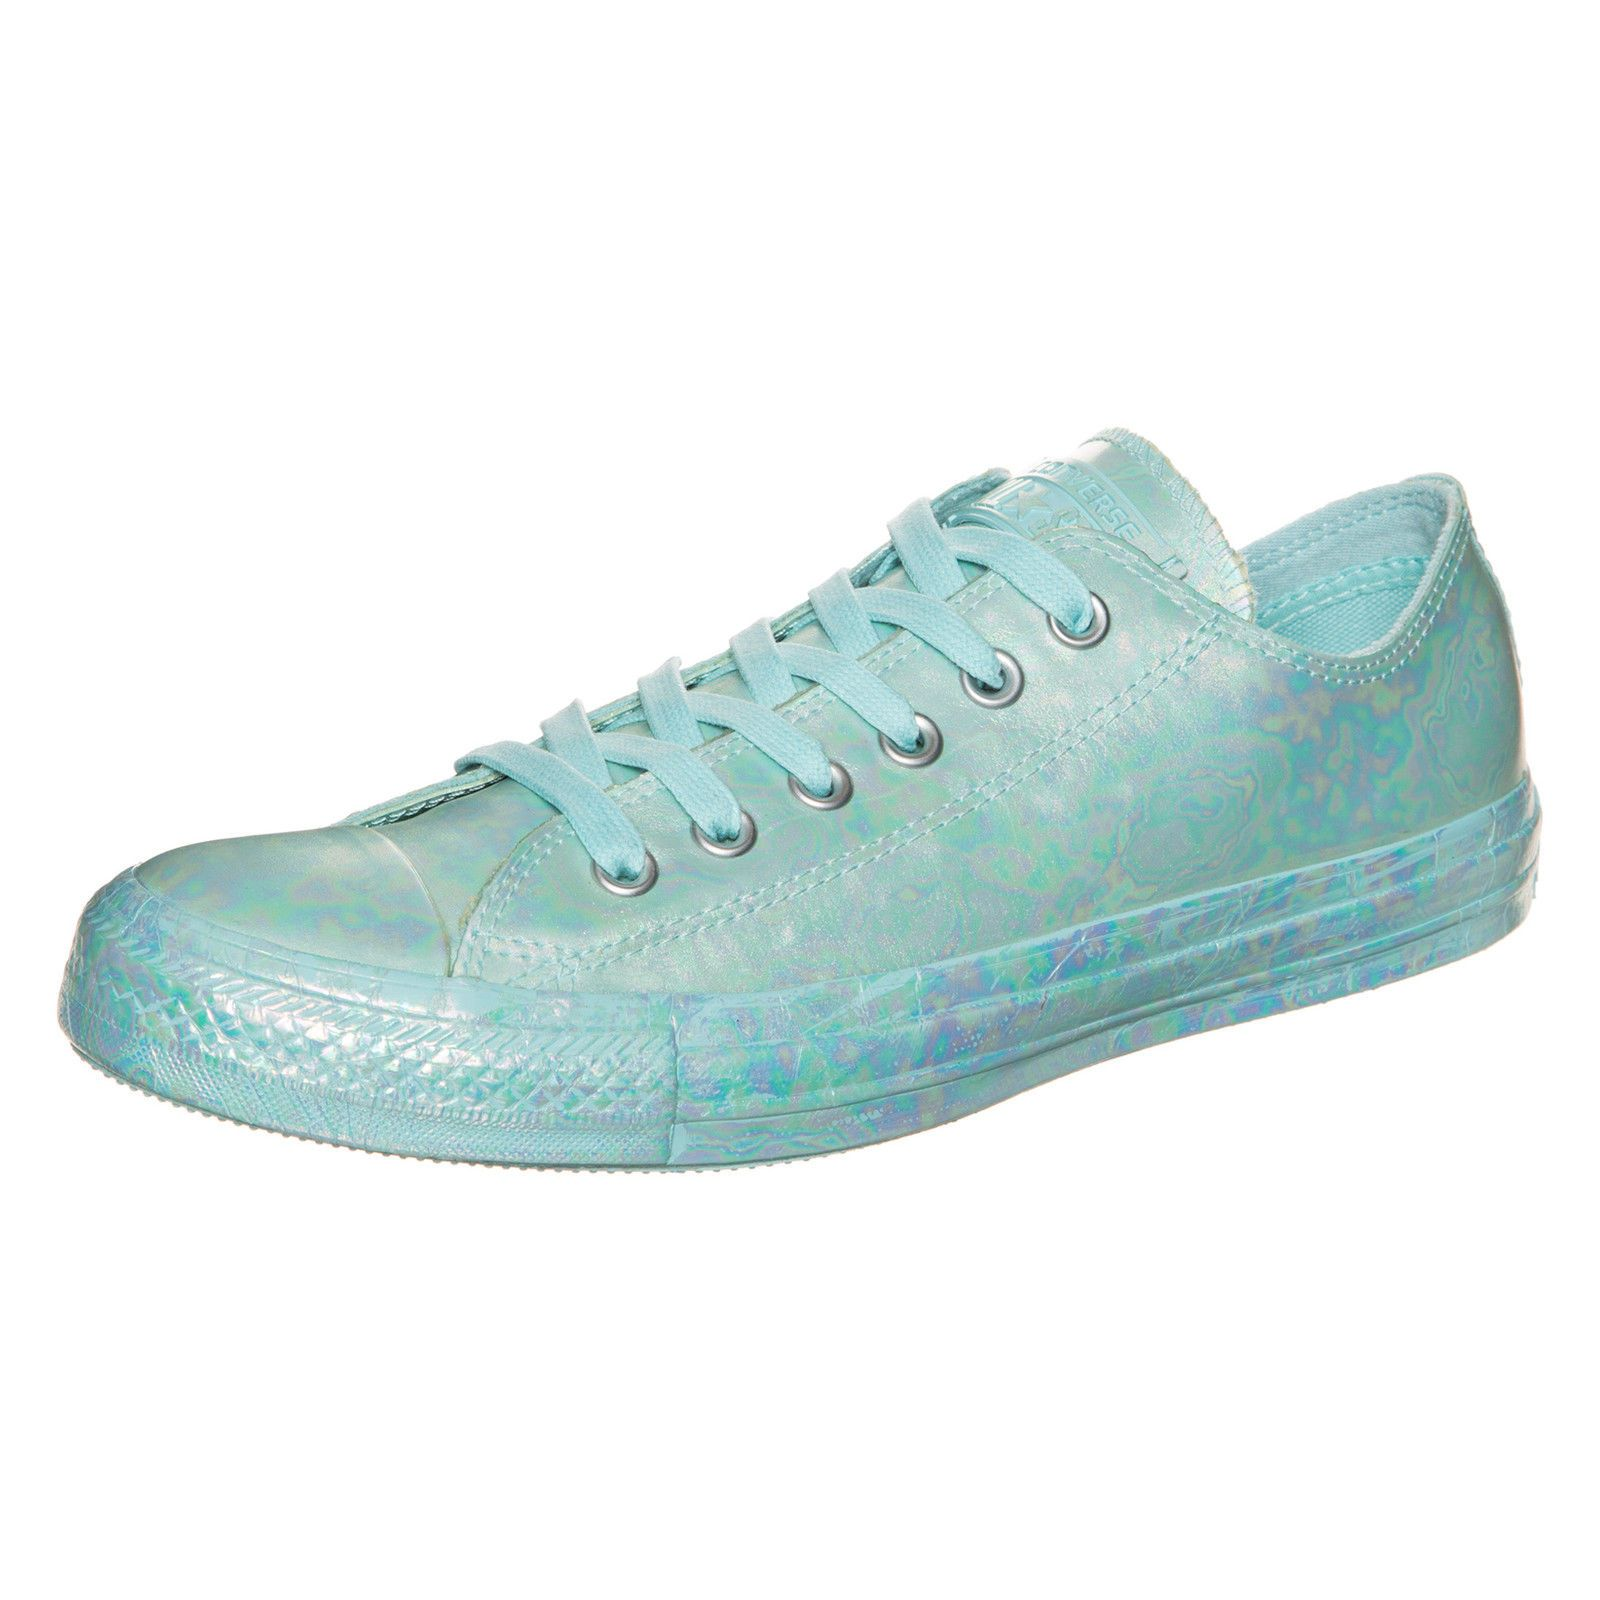 1aa97e77fe9a32 Converse Chuck Taylor All Star 70 Hi Jaded   Black   Egret Sneaker Schuhe -  cdearth.org